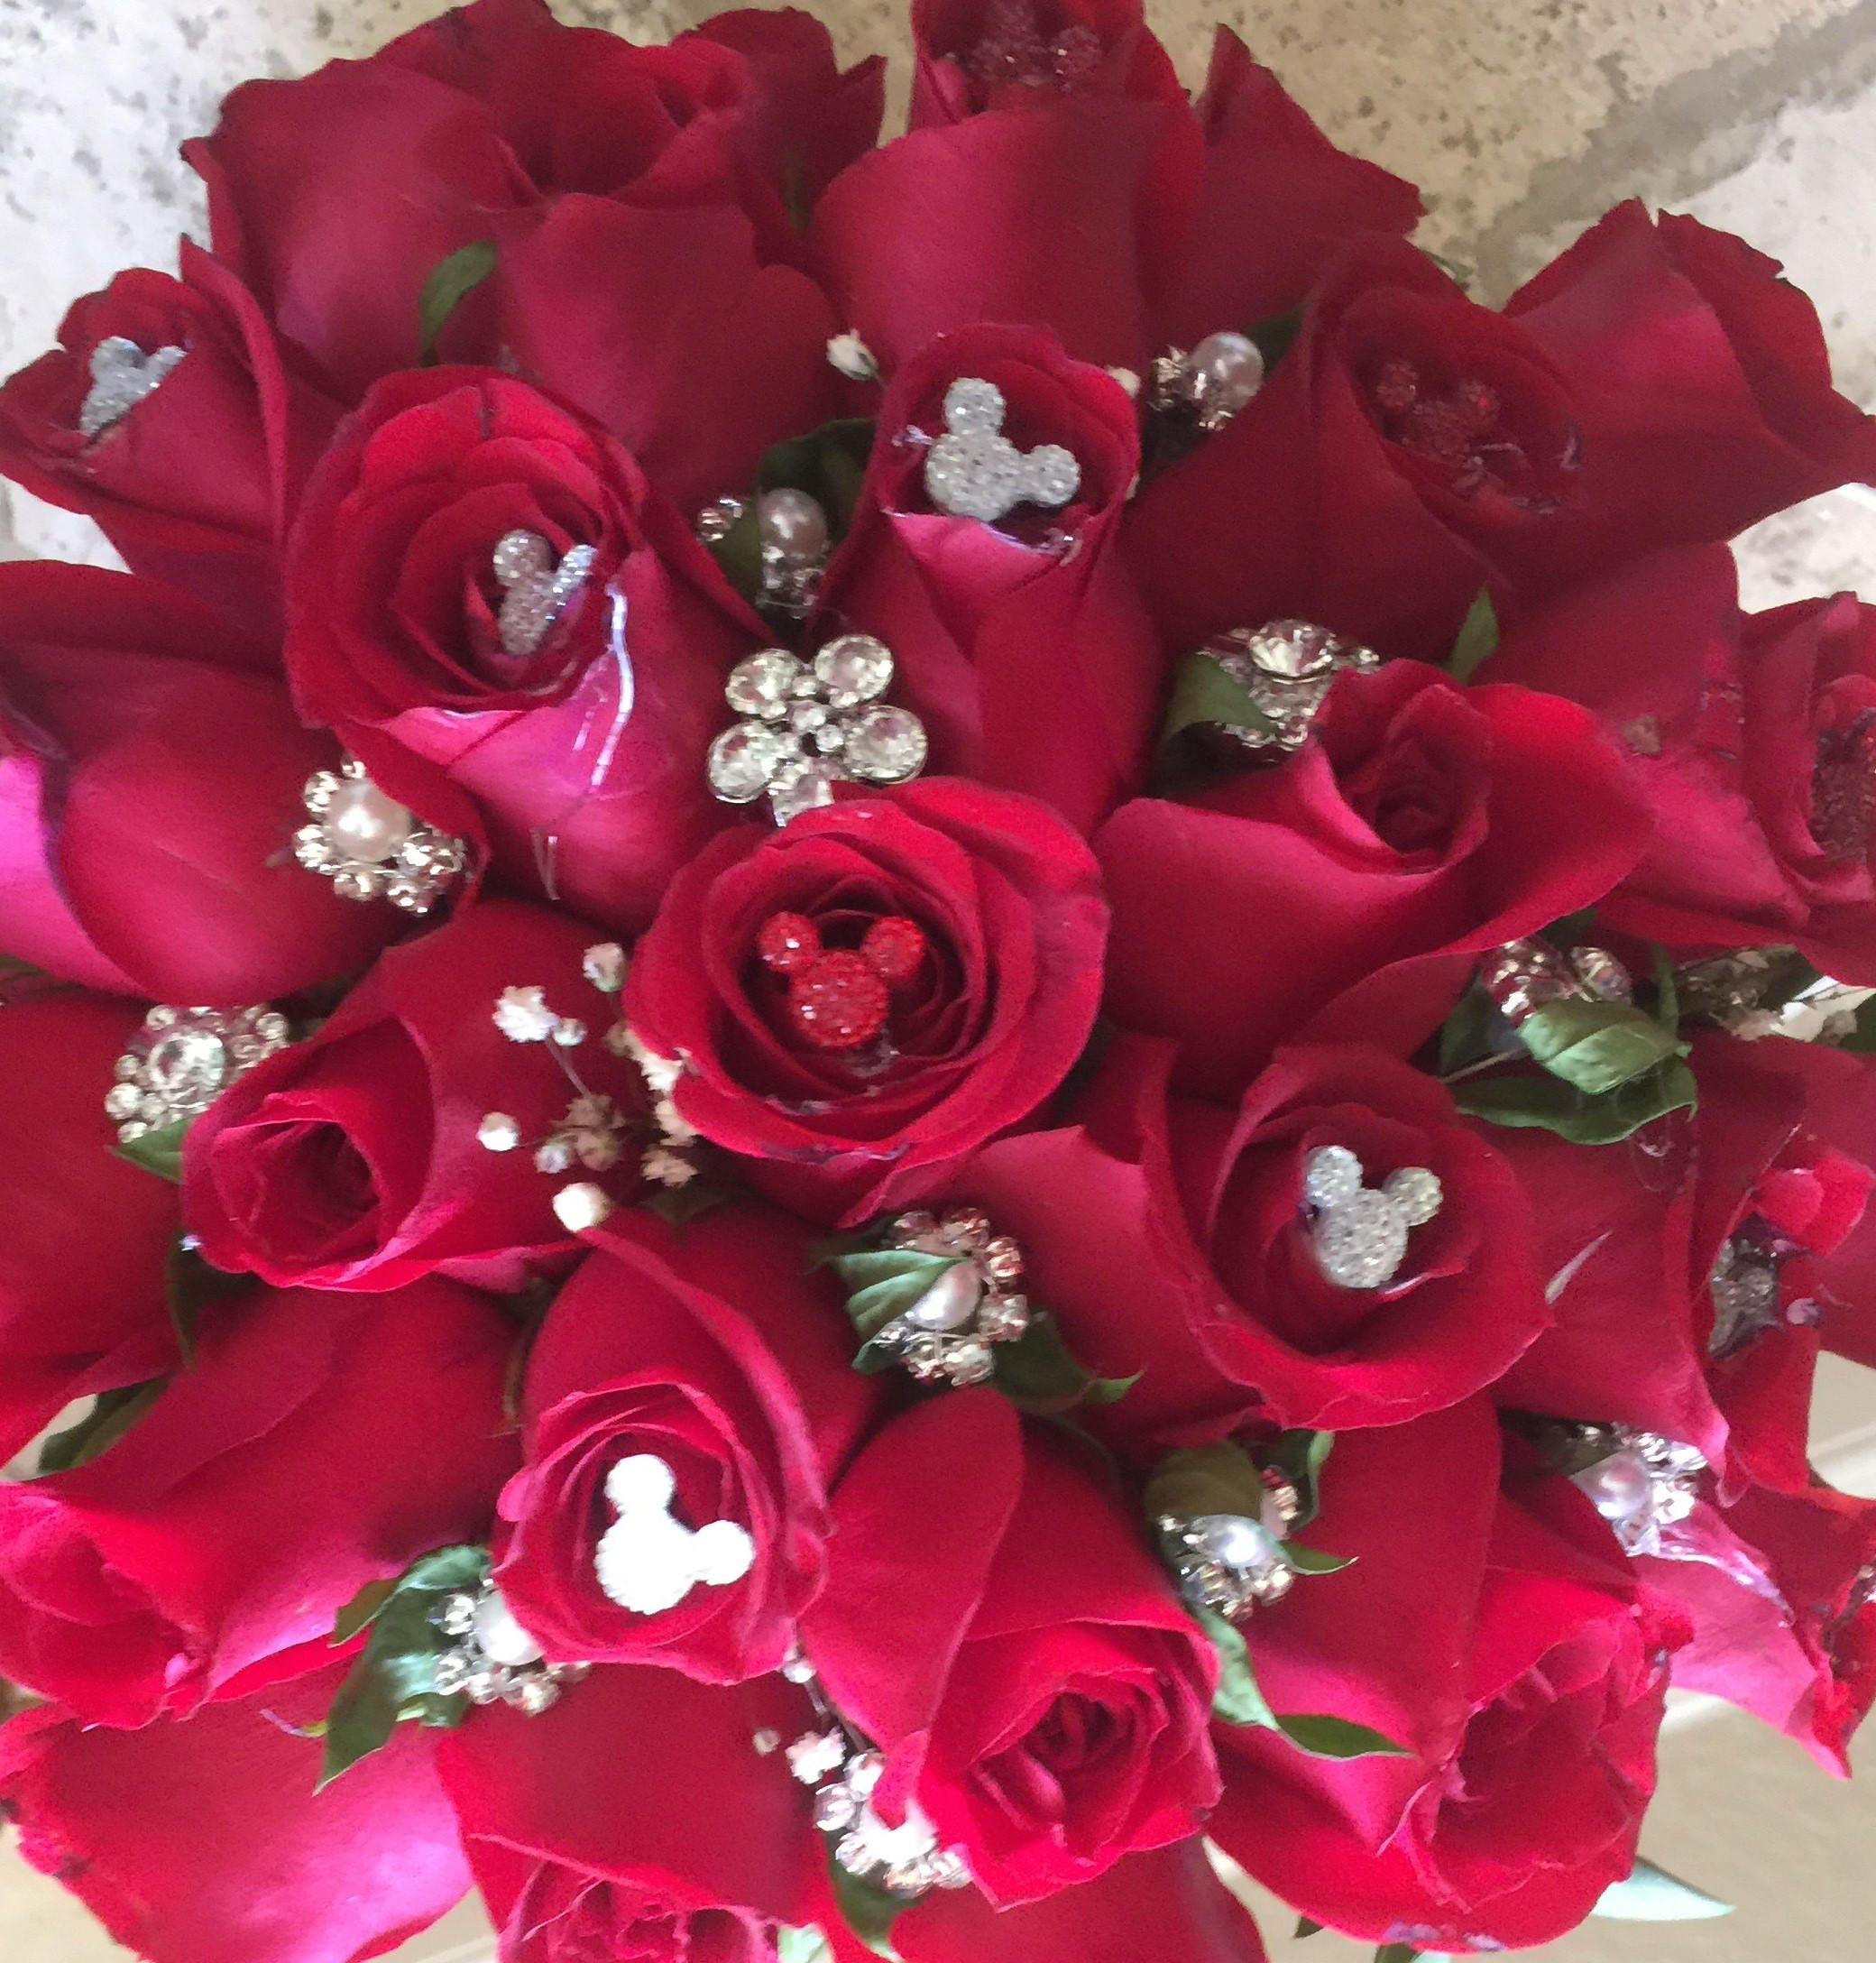 12 disney inspired wedding flower pins hidden mickey mouse bouquets 12 disney inspired wedding flower pins hidden mickey mouse bouquets crystal clear or choose color izmirmasajfo Image collections